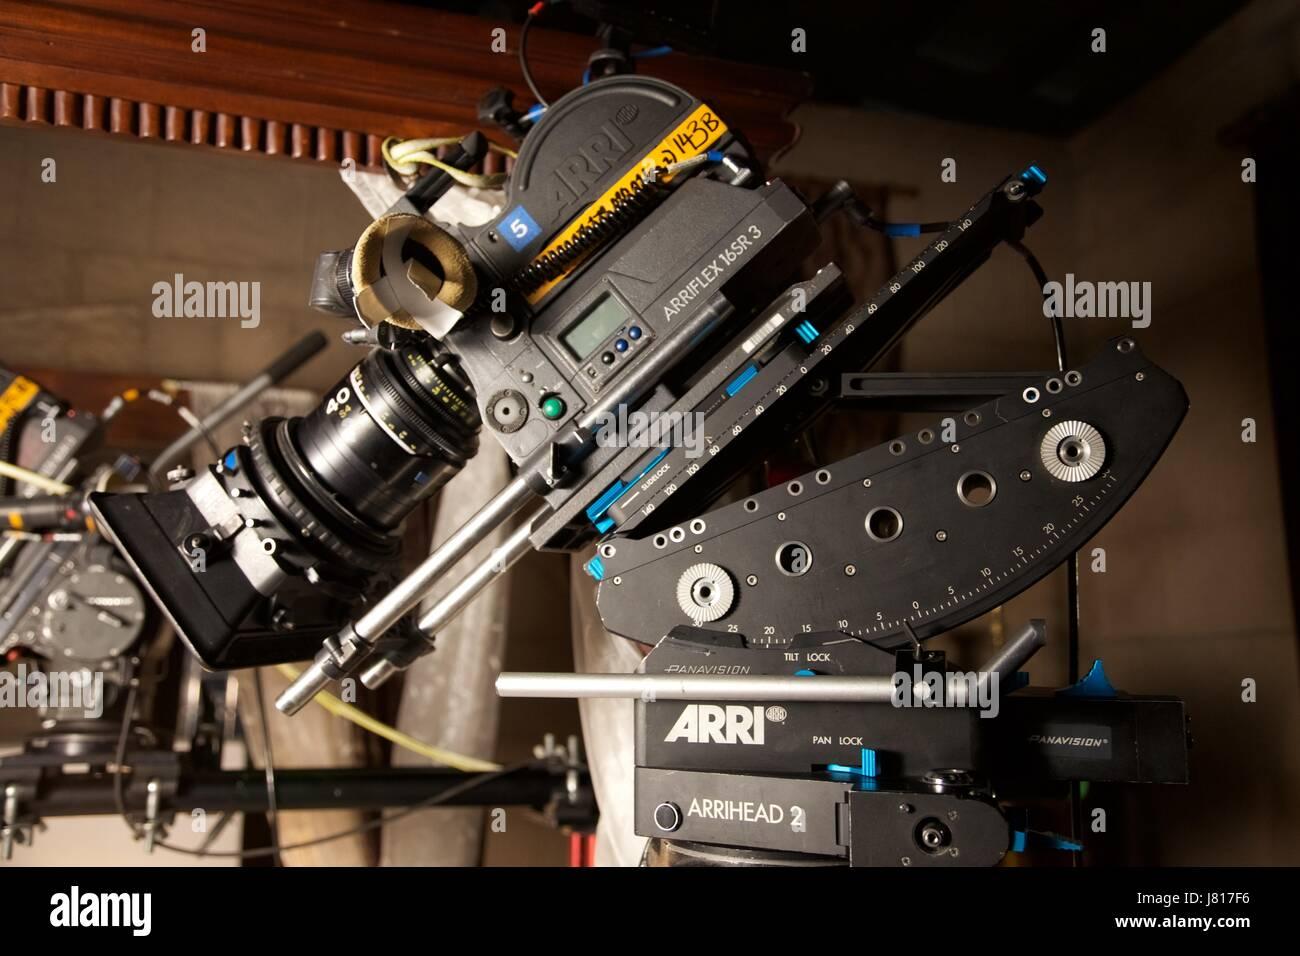 Arriflex SR3 super 16mm film cameras on set Stock Photo